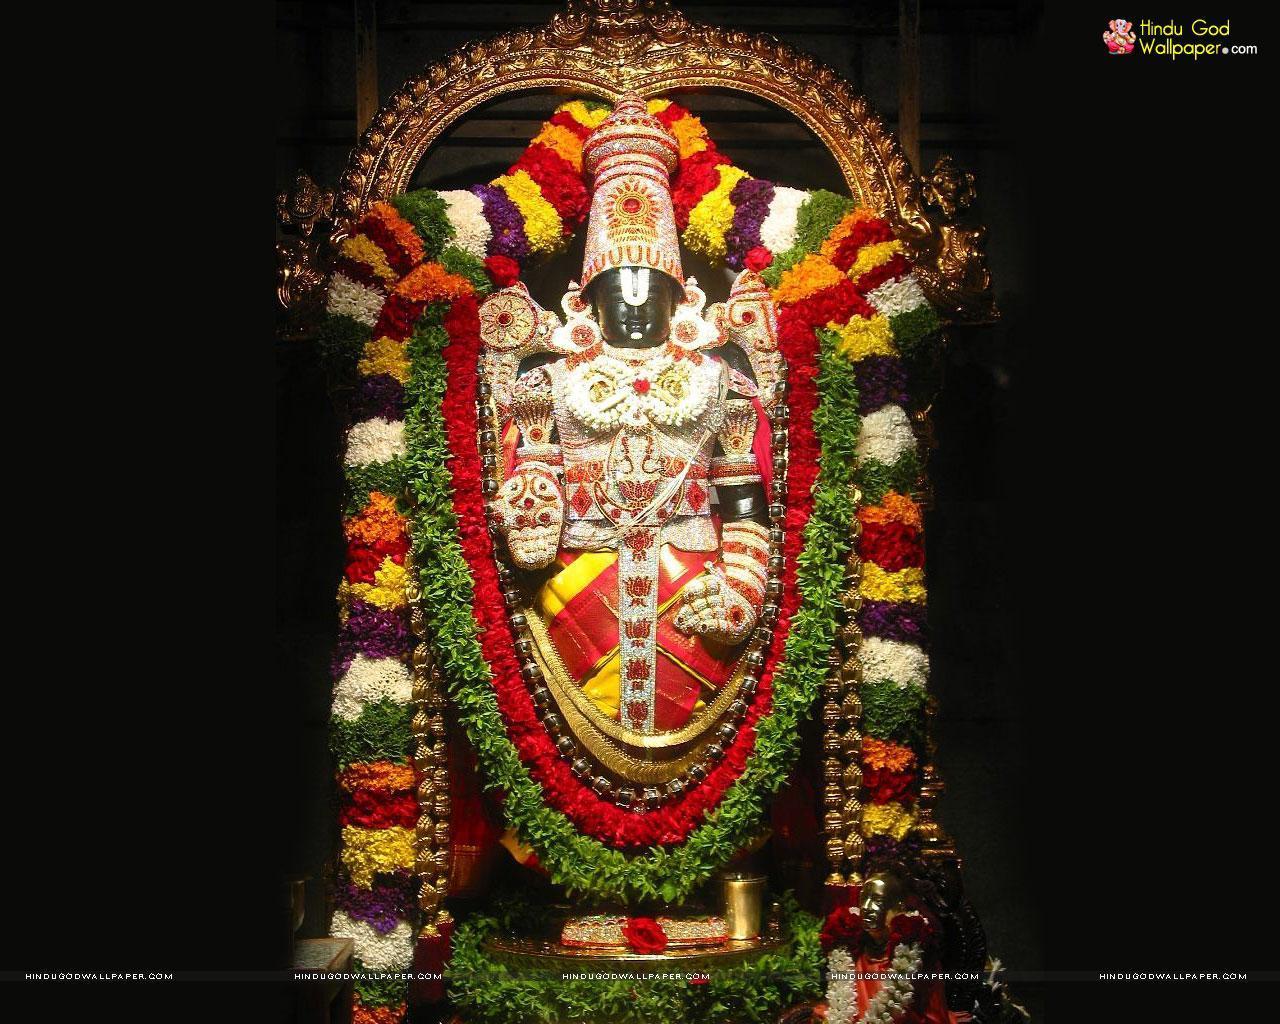 Tirupati Balaji Wallpapers Top Free Tirupati Balaji Backgrounds Wallpaperaccess